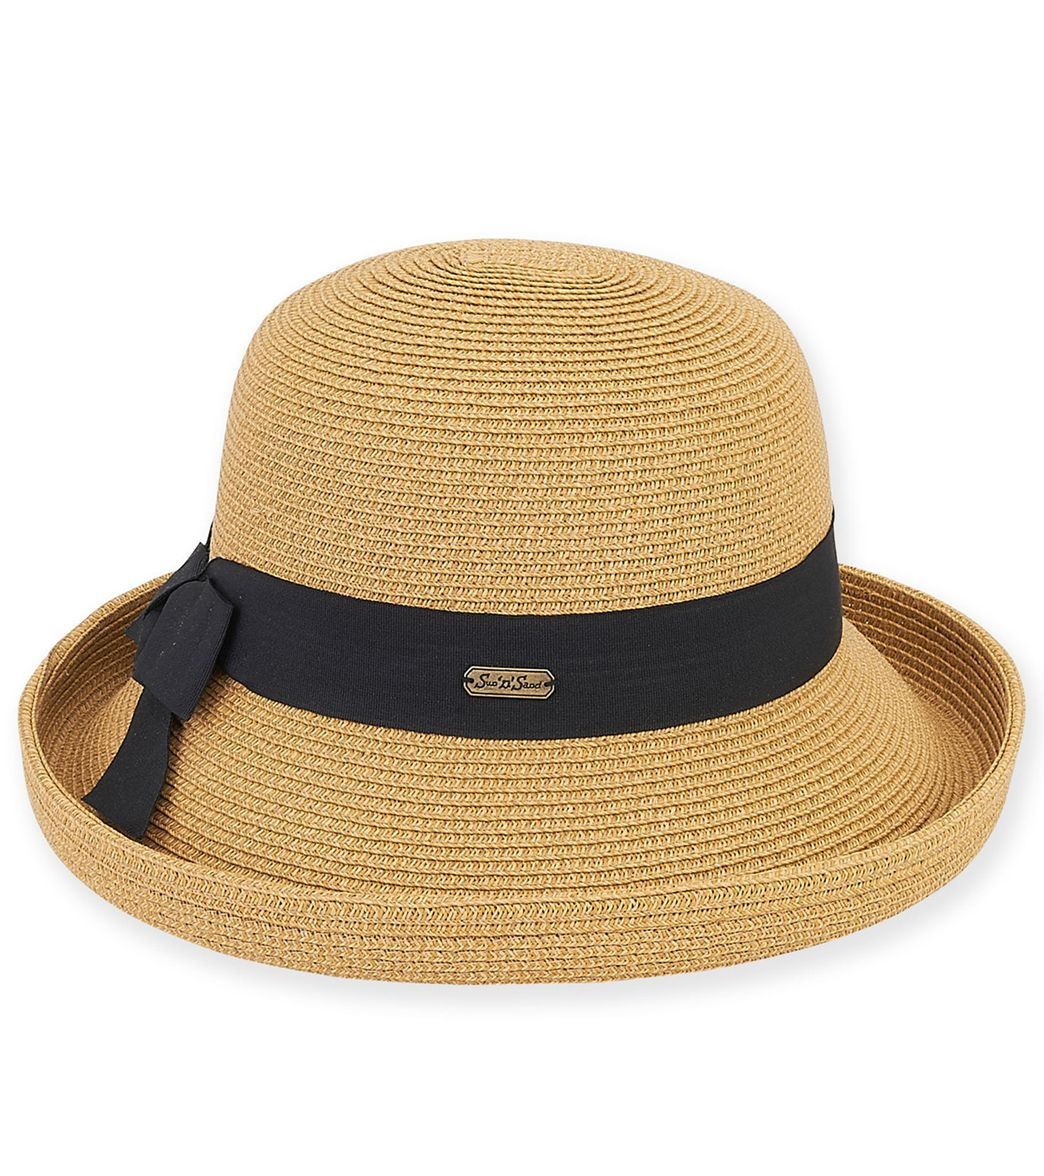 Details about  /Sun /'N/' Sand Wool Felt Floppy Brim